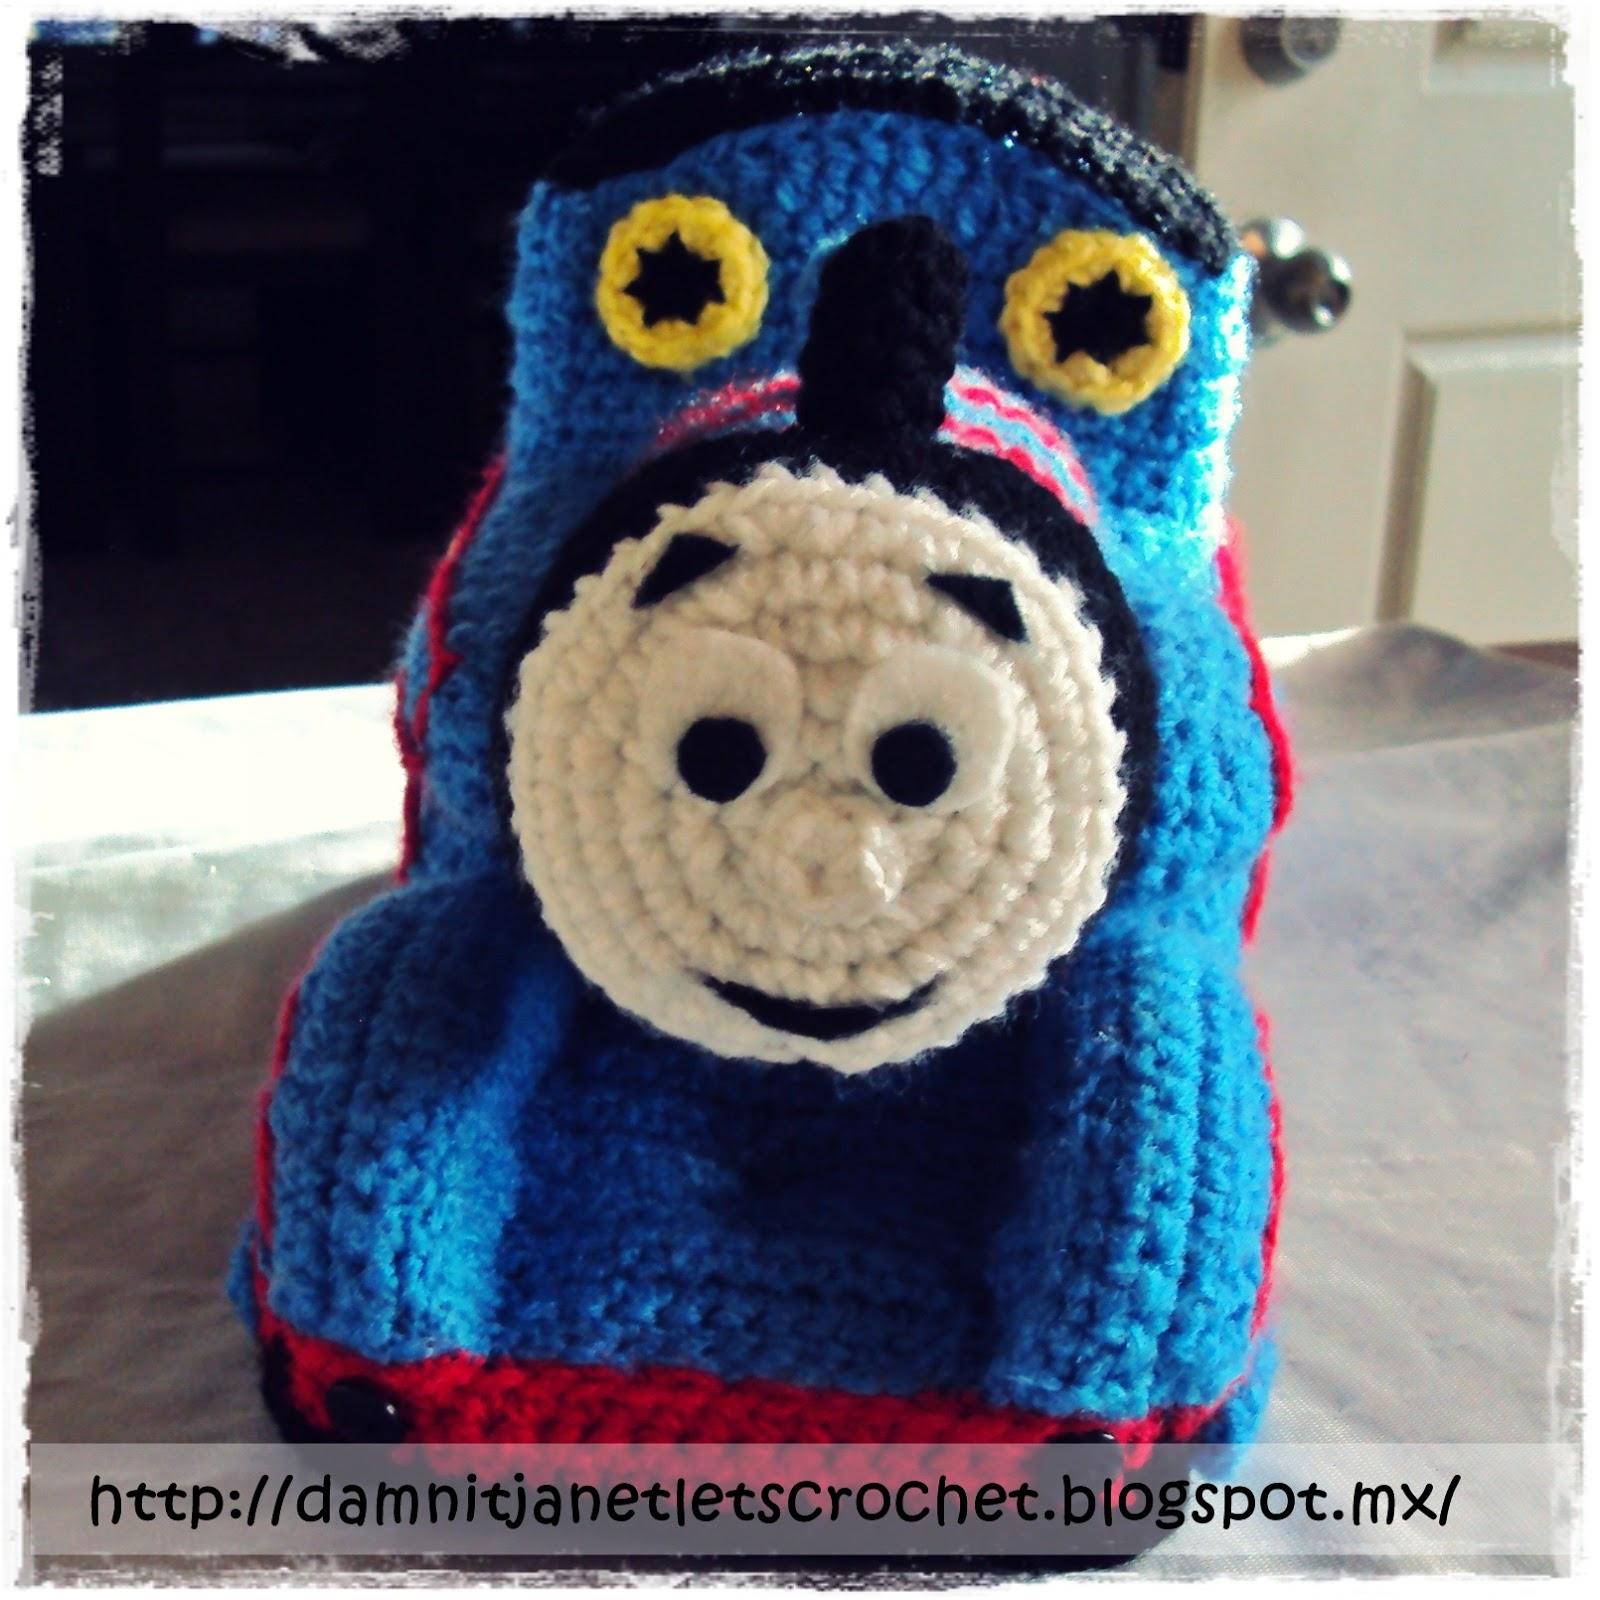 Free Crochet Hat Pattern For Thomas The Train : damn it Janet, lets crochet!: Thomas beanie and amigurumi